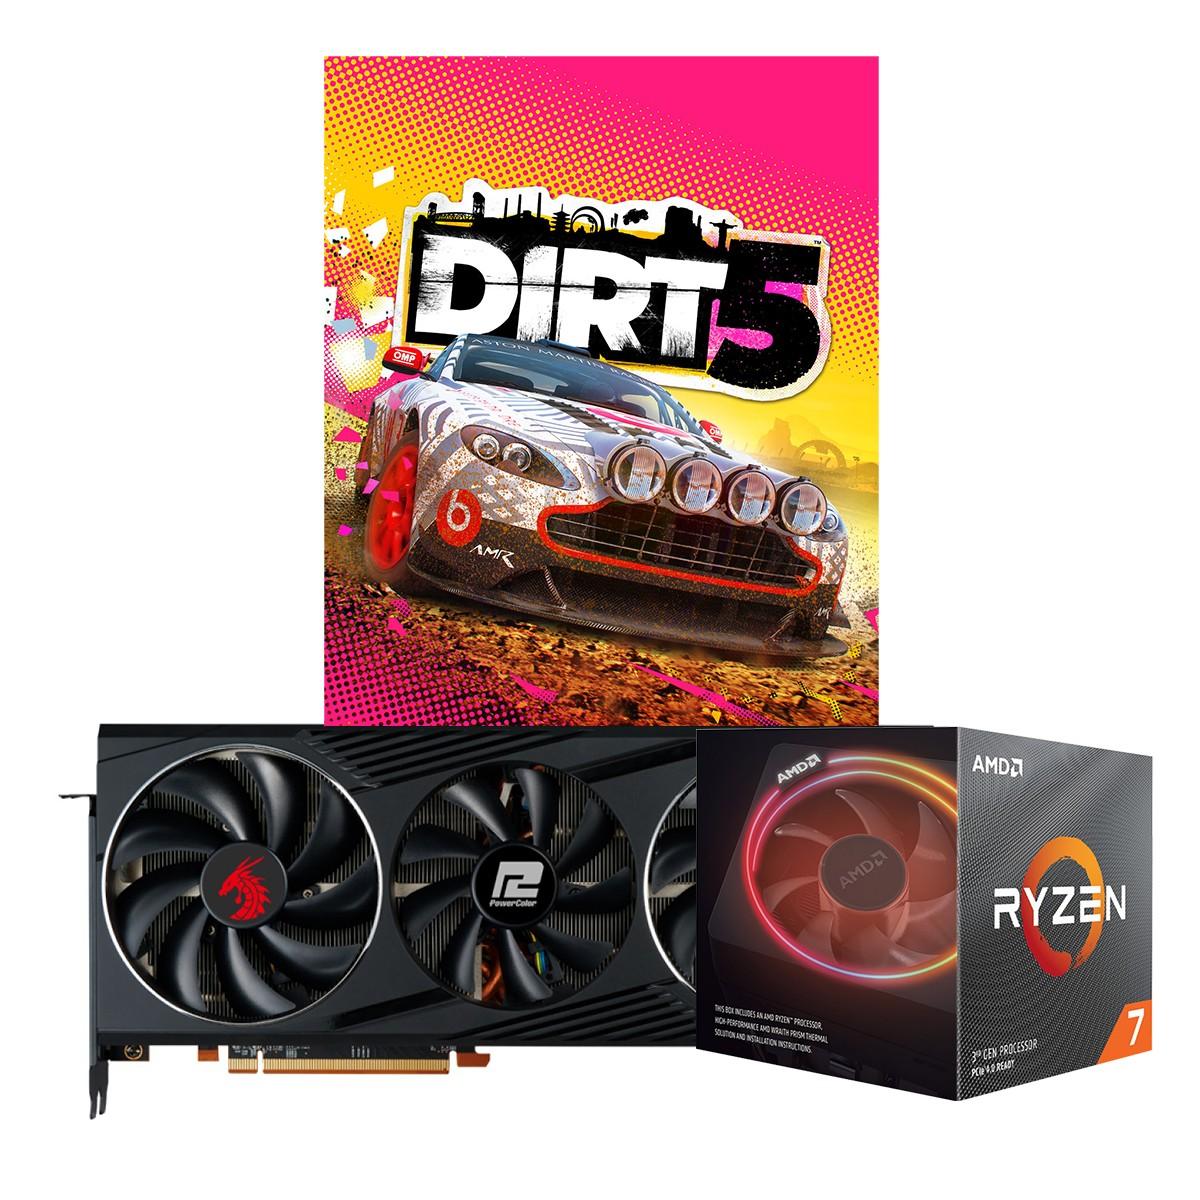 Kit Upgrade PowerColor Radeon RX 6800 Red Dragon + AMD Ryzen 7 3700X + Brinde Jogo Dirt 5